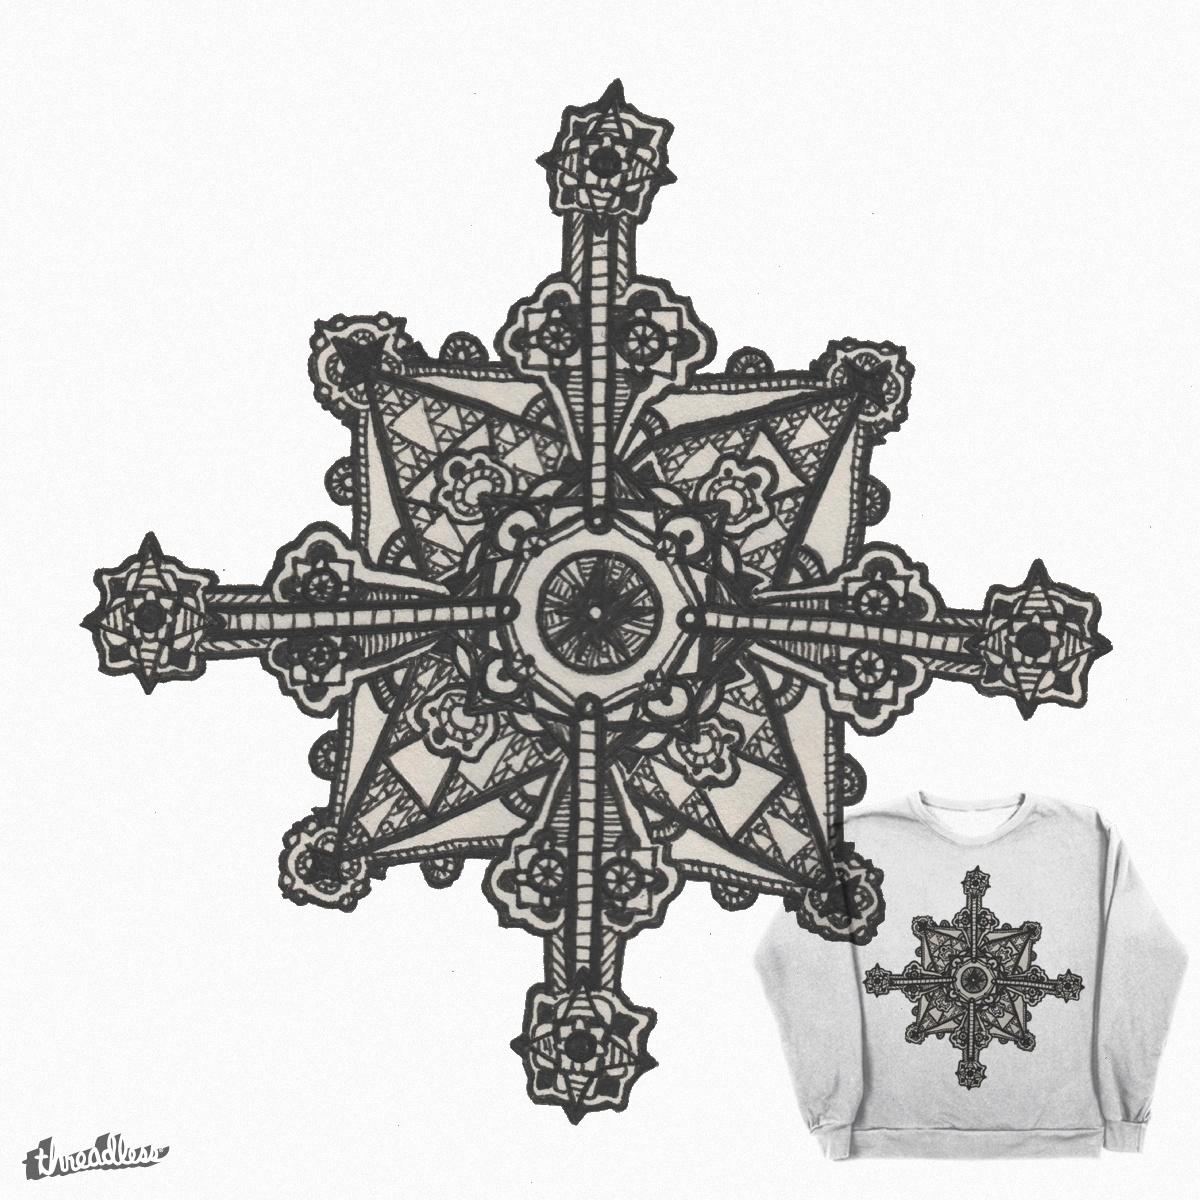 Symmetry by Djenne on Threadless